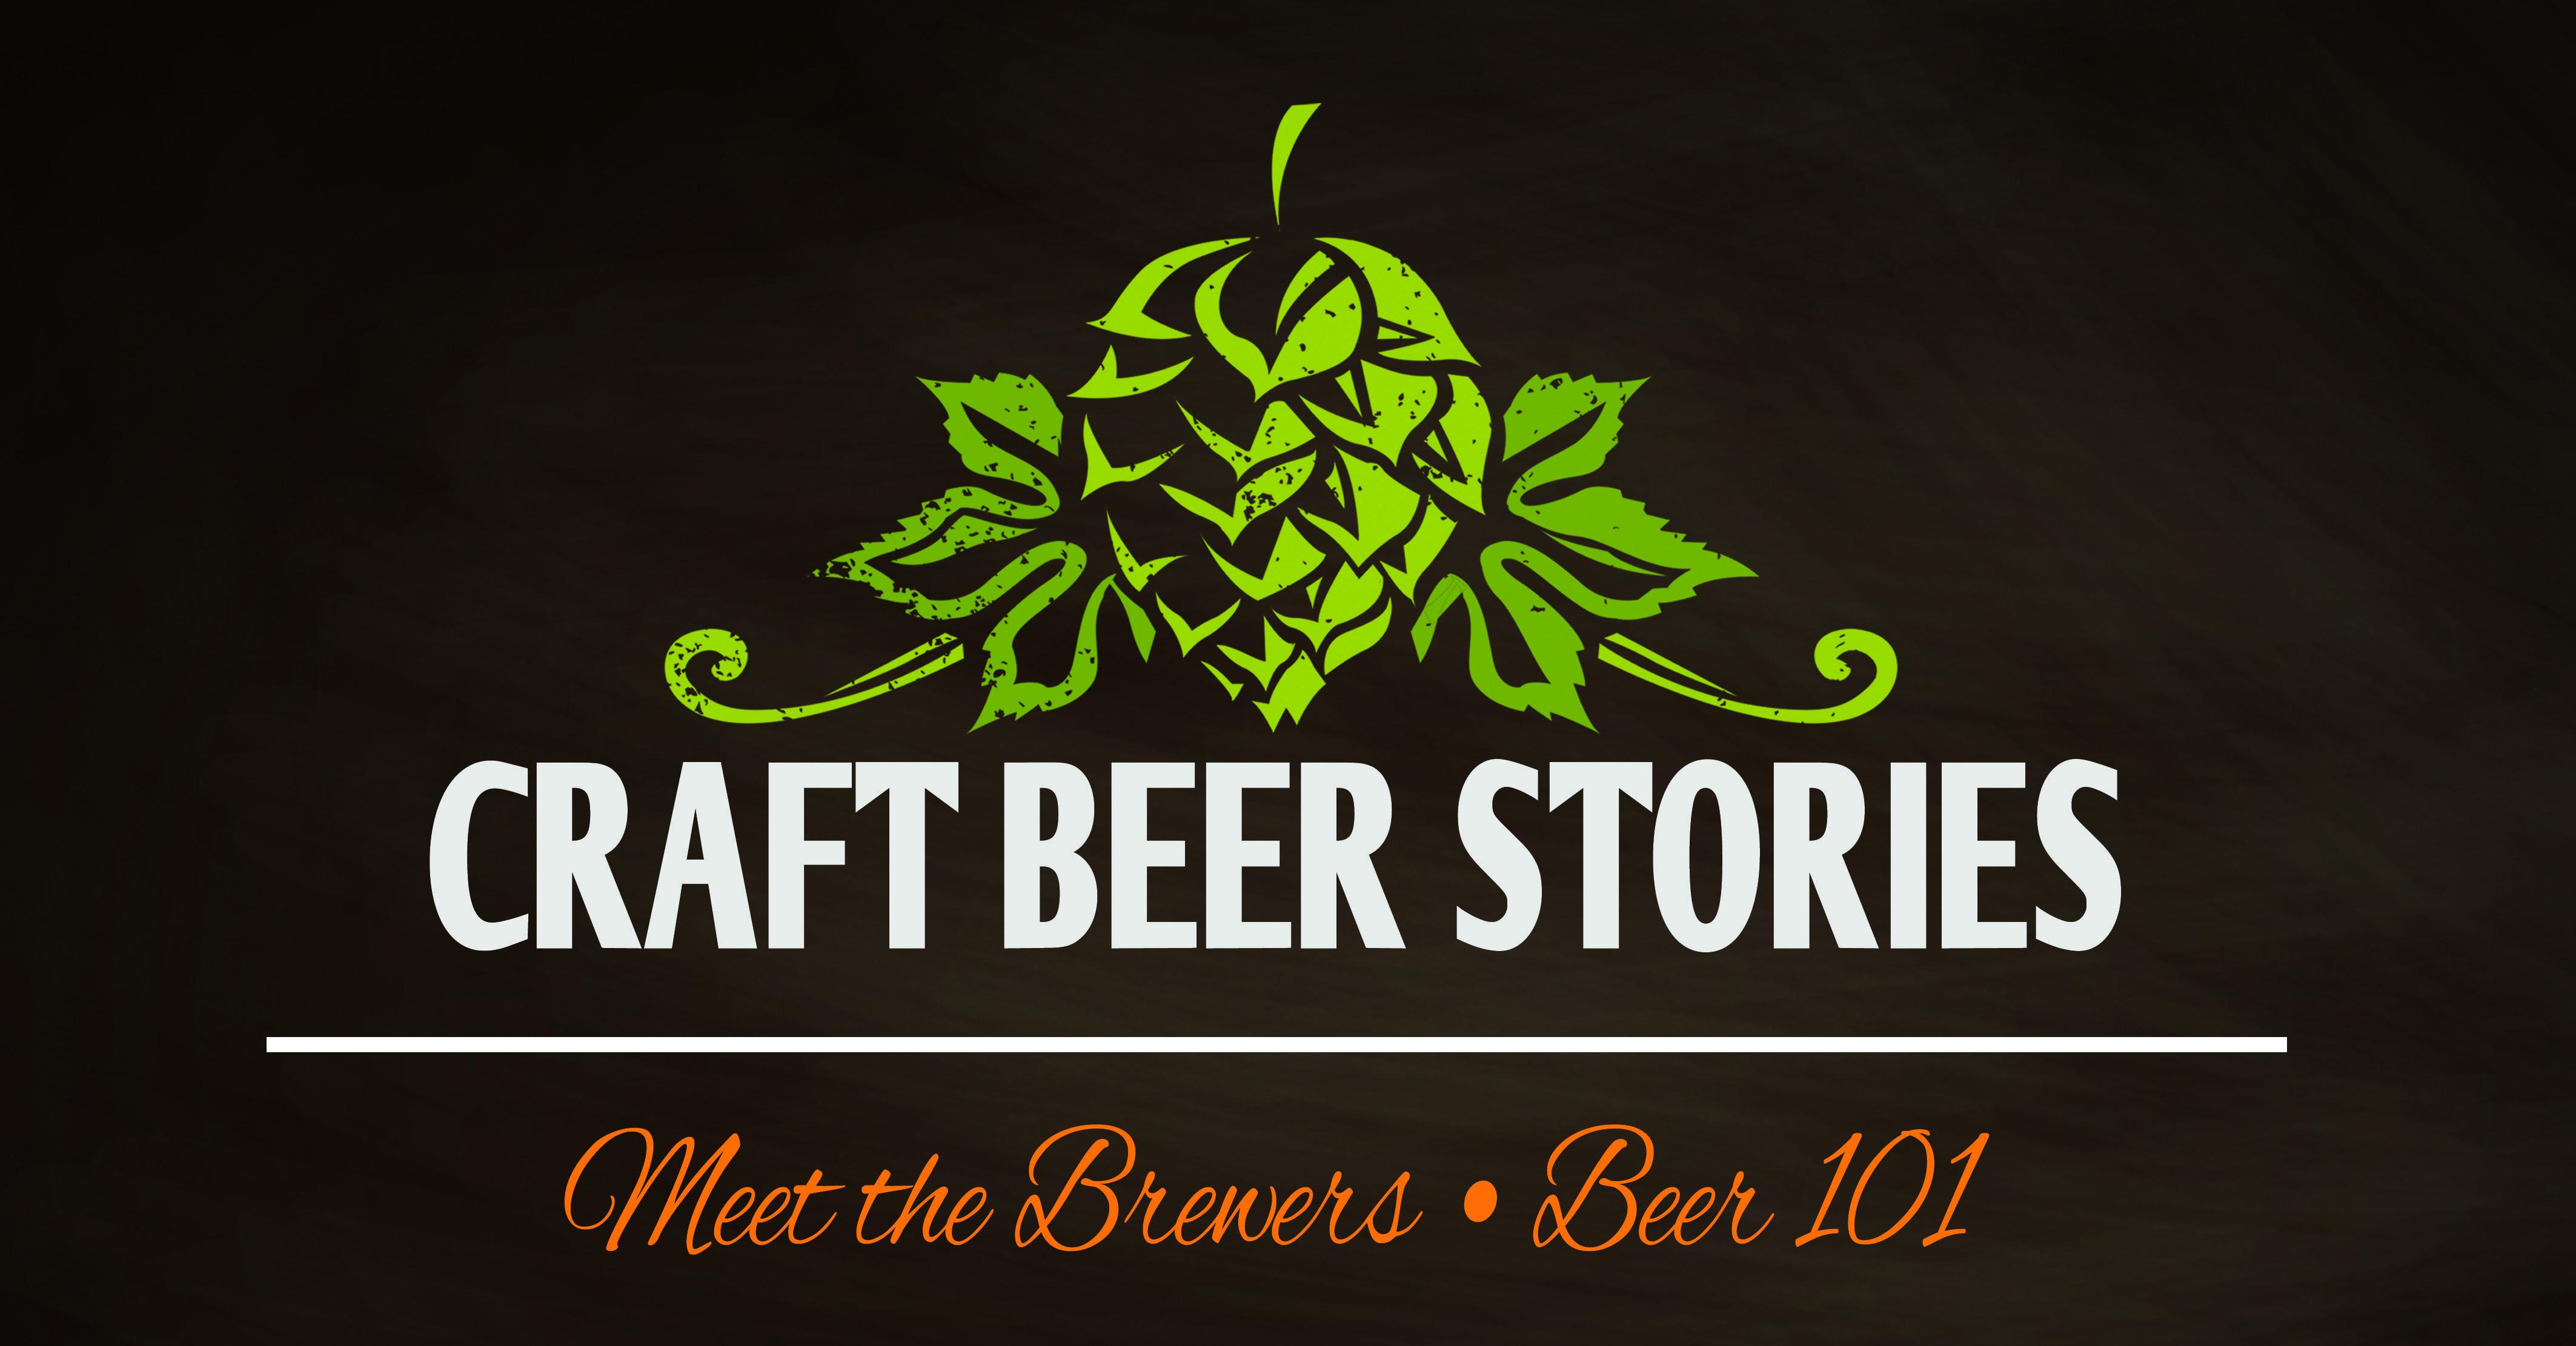 Craft Beer Stories Presents Garvies Point Bre